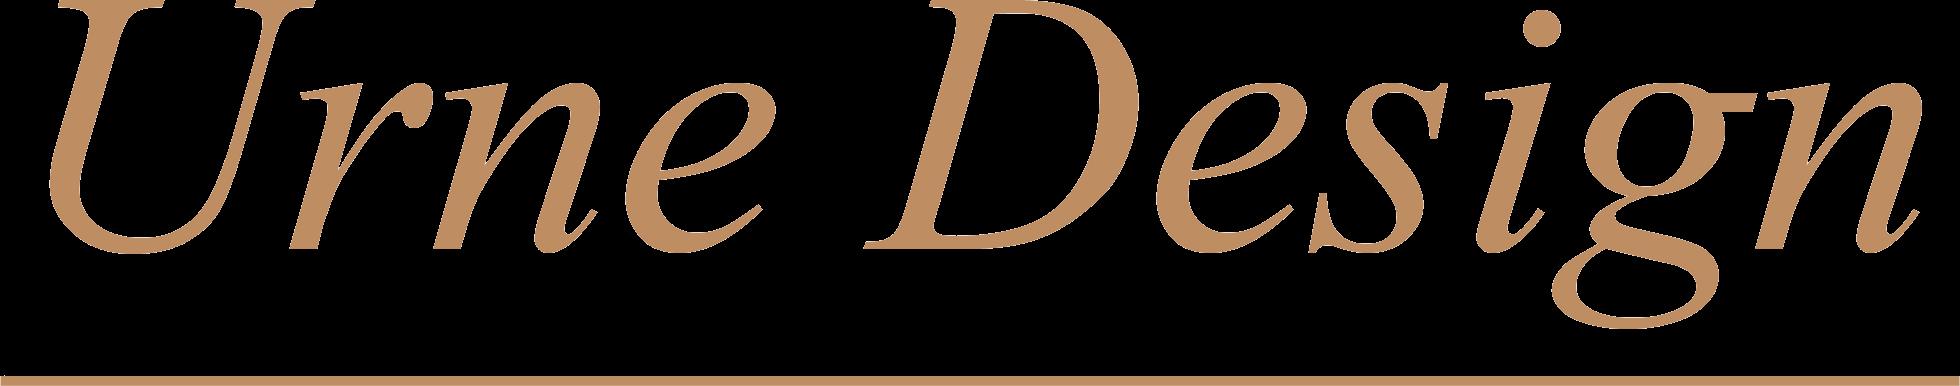 Urne Design – Urne cinerarie artigianali, accessori e articoli cimiteriali